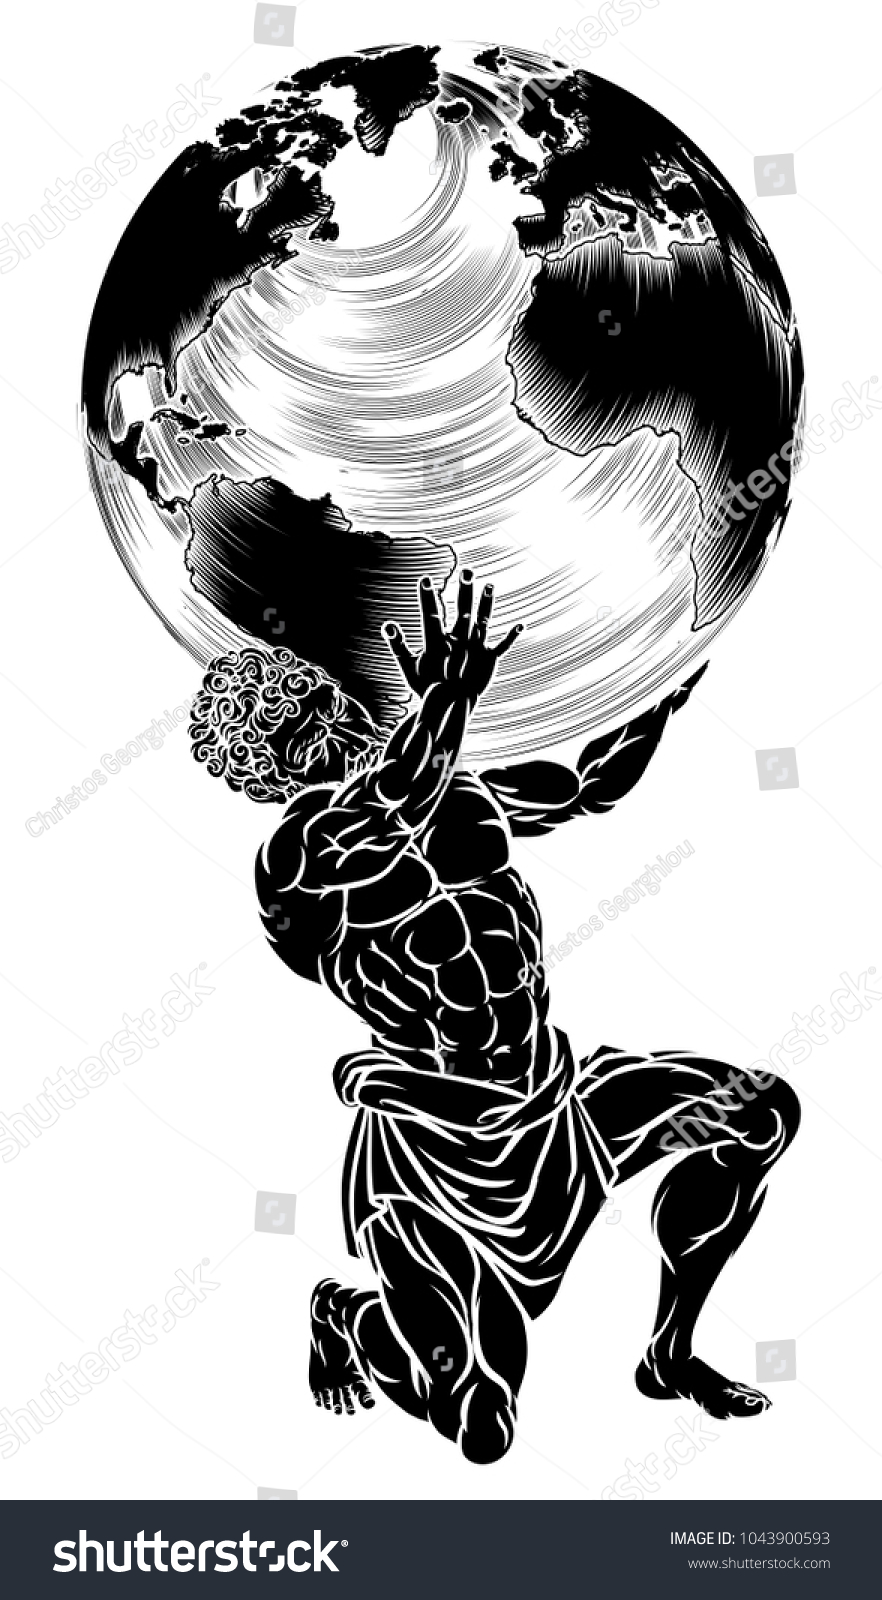 Atlas titan greek mythology symbol strength stock vector 1043900593 atlas titan from greek mythology symbol of strength sentenced by the gods to hold up the buycottarizona Images